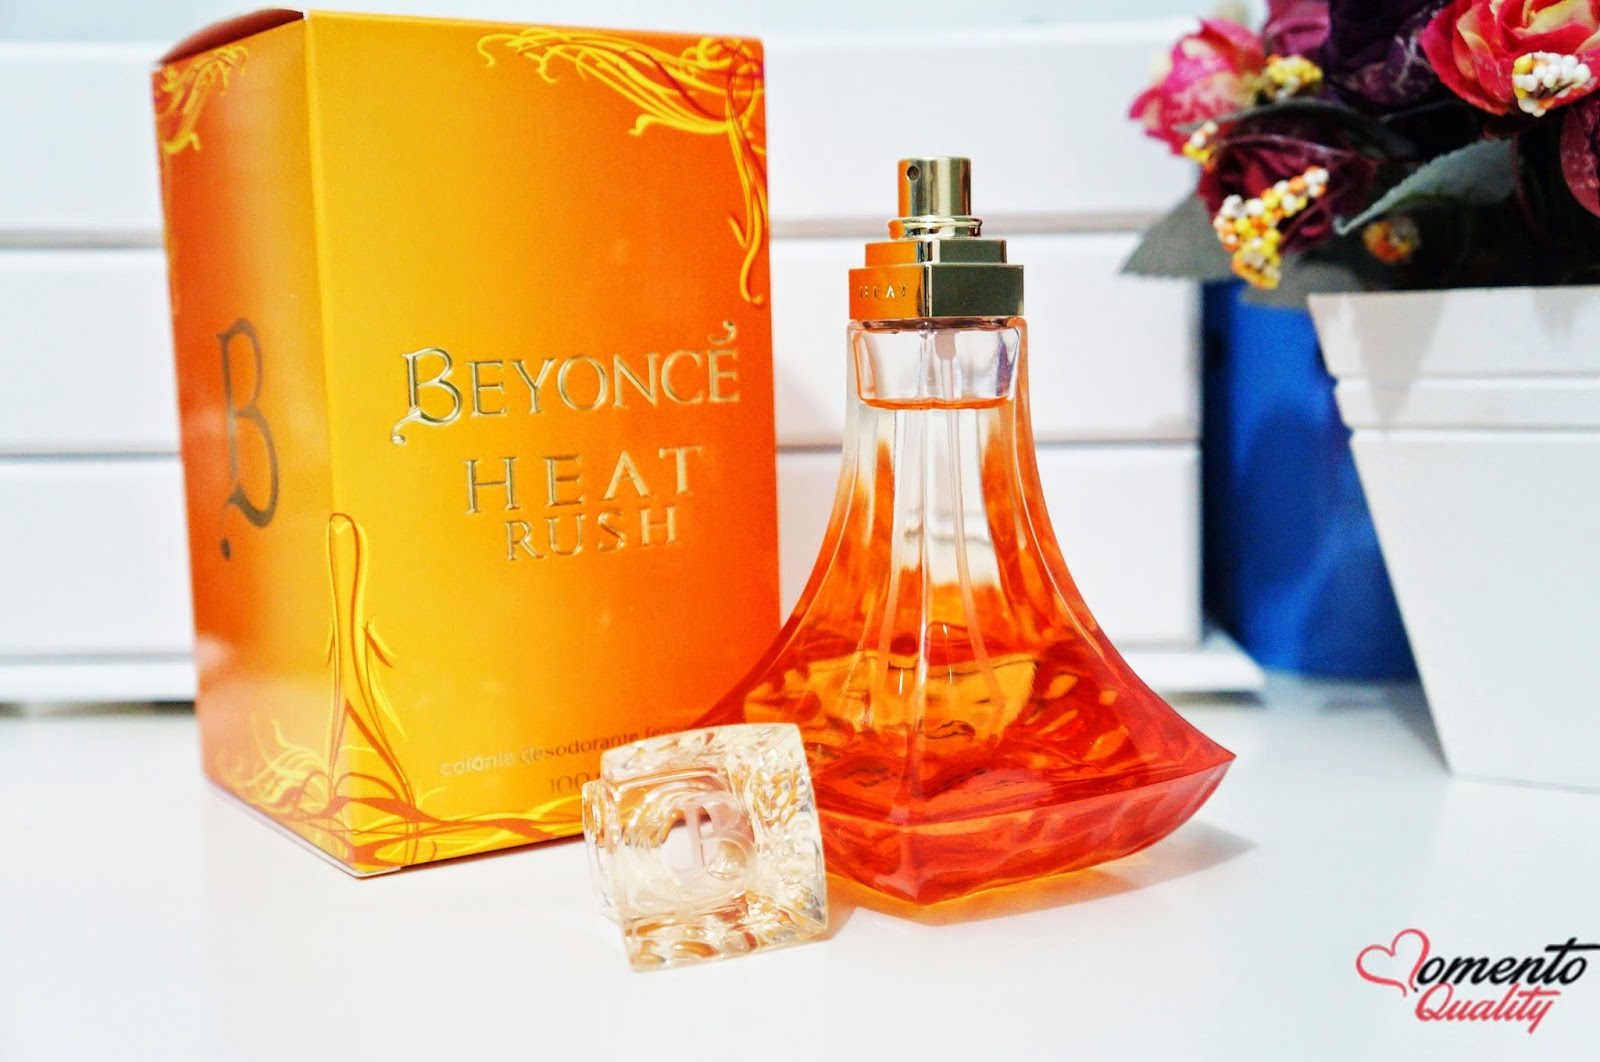 Beyoncé Heat Rush